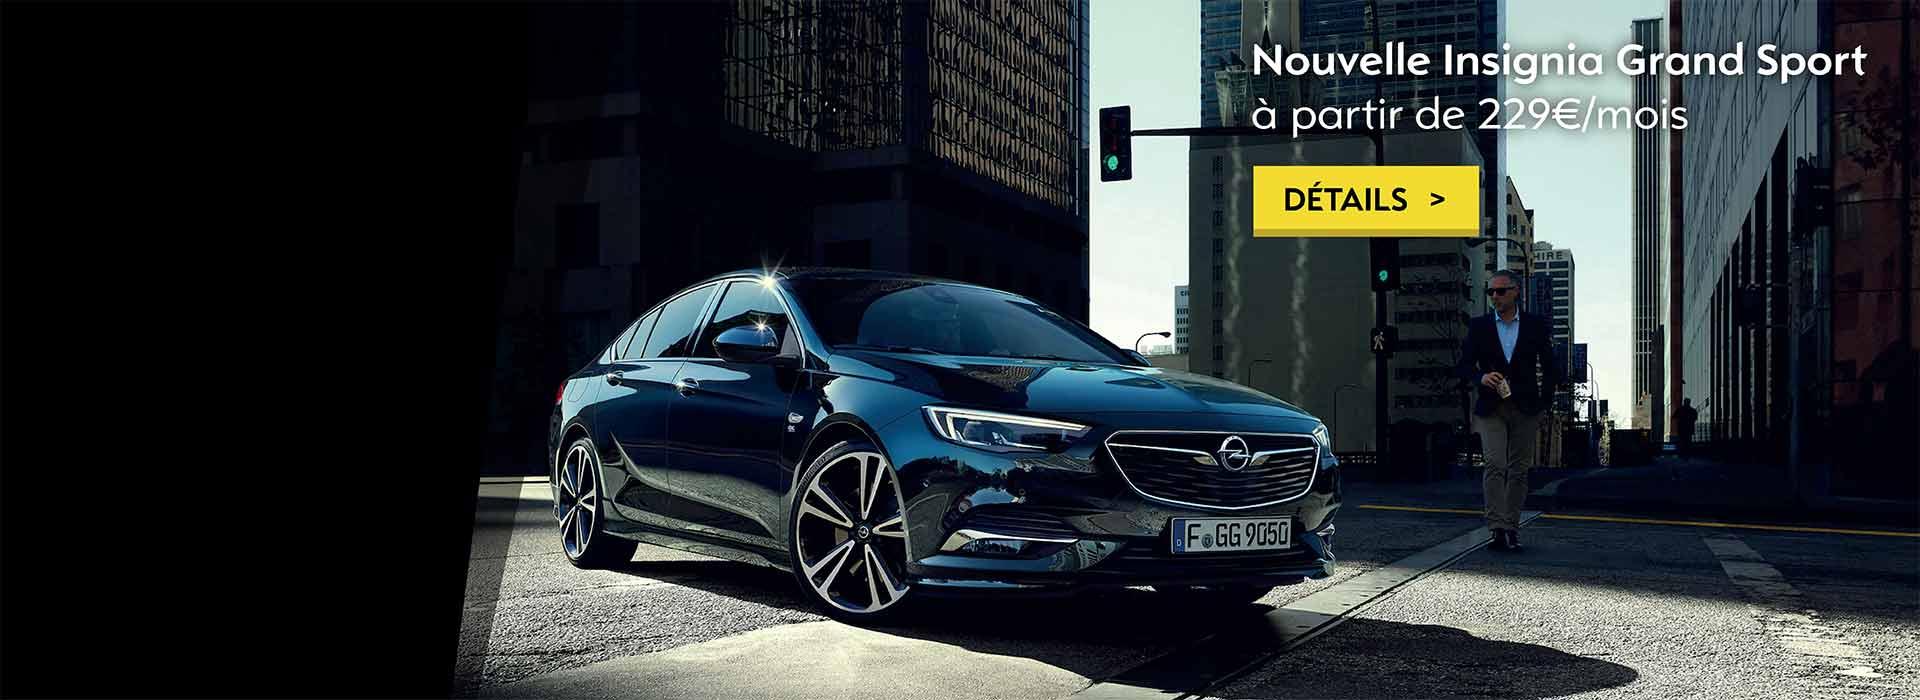 Opel belfort vente voiture neuve vehicule occasion for Garage qui vend des voitures d occasion a credit